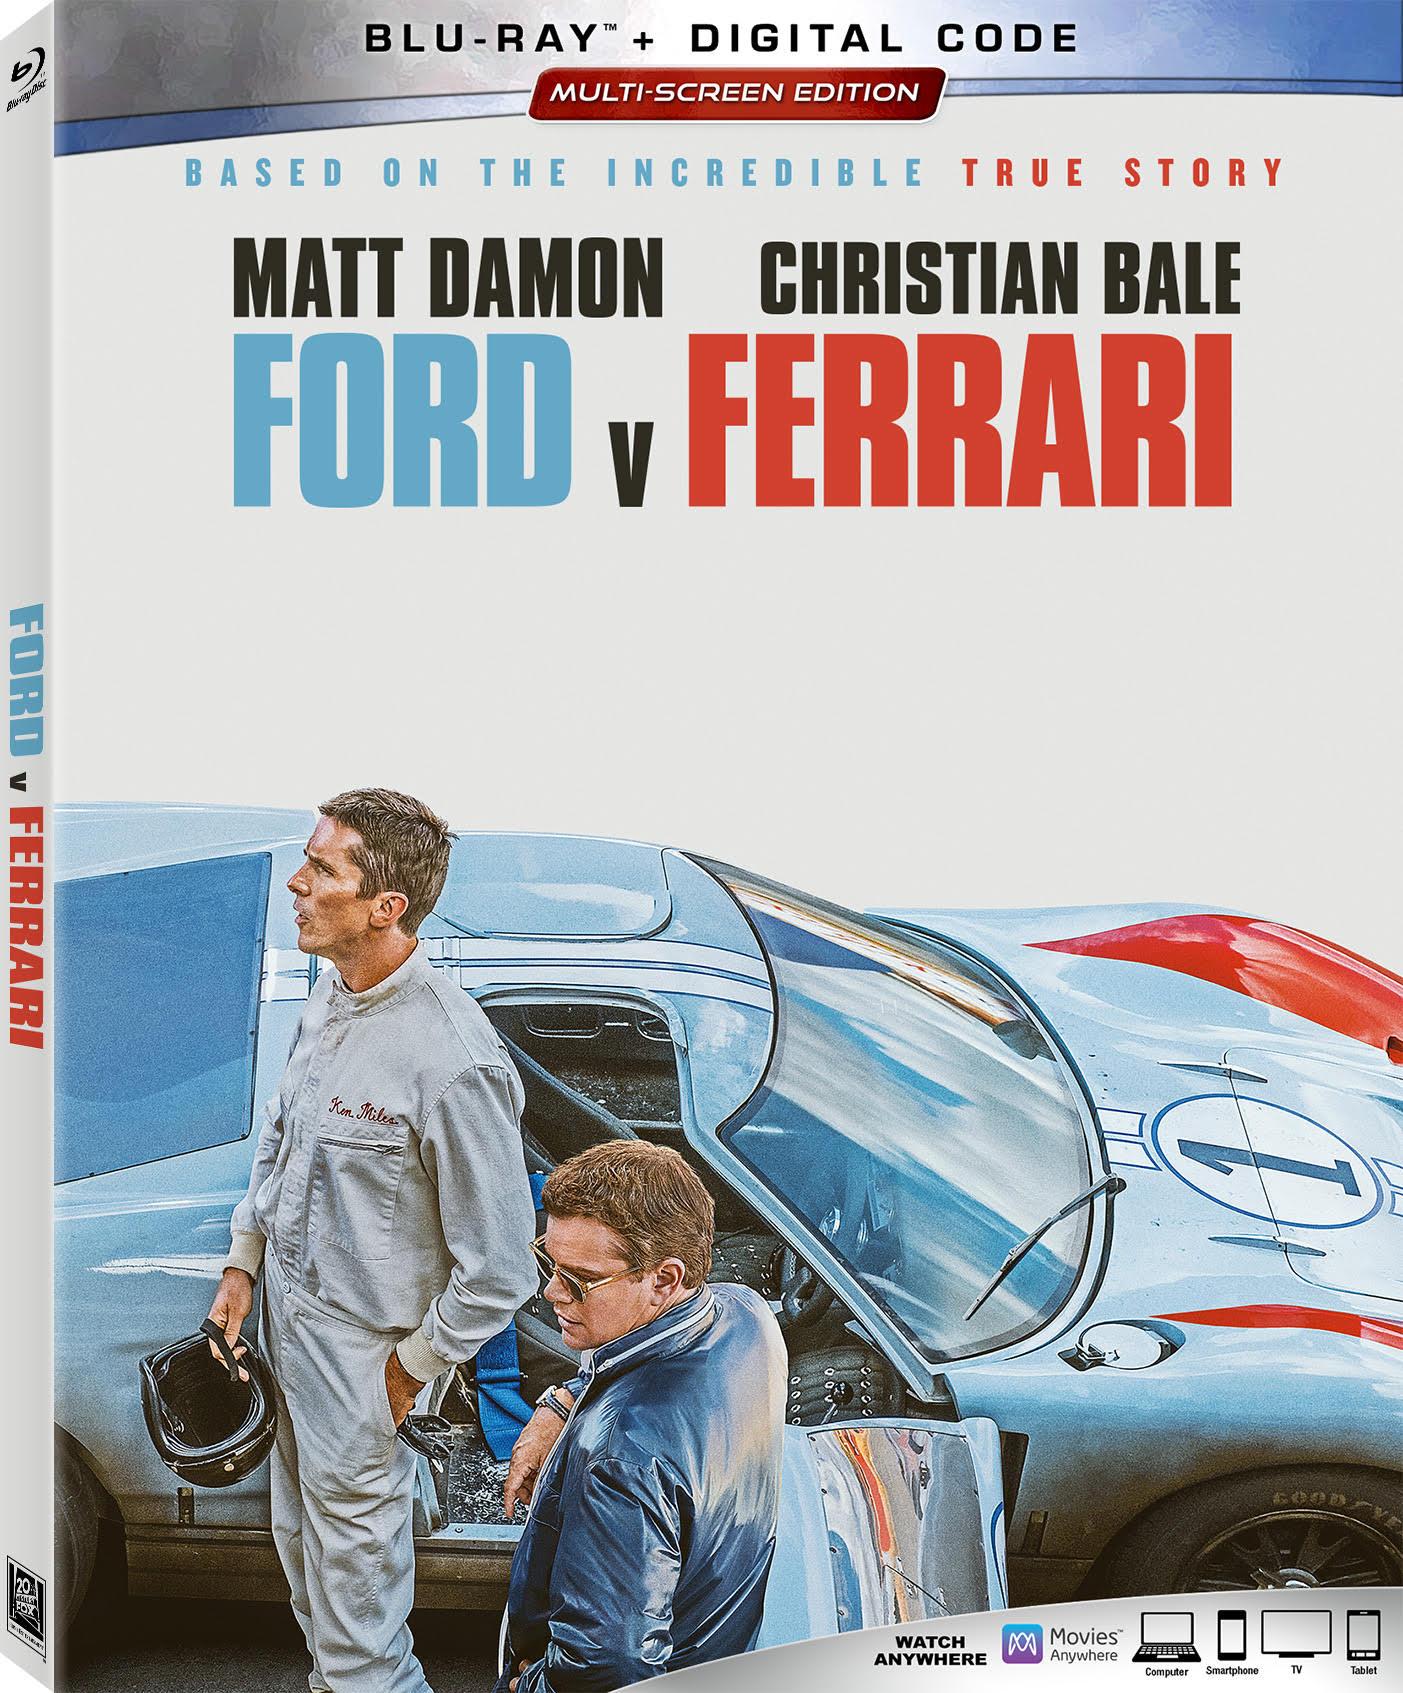 Ford v Ferrari Blu-ray Image